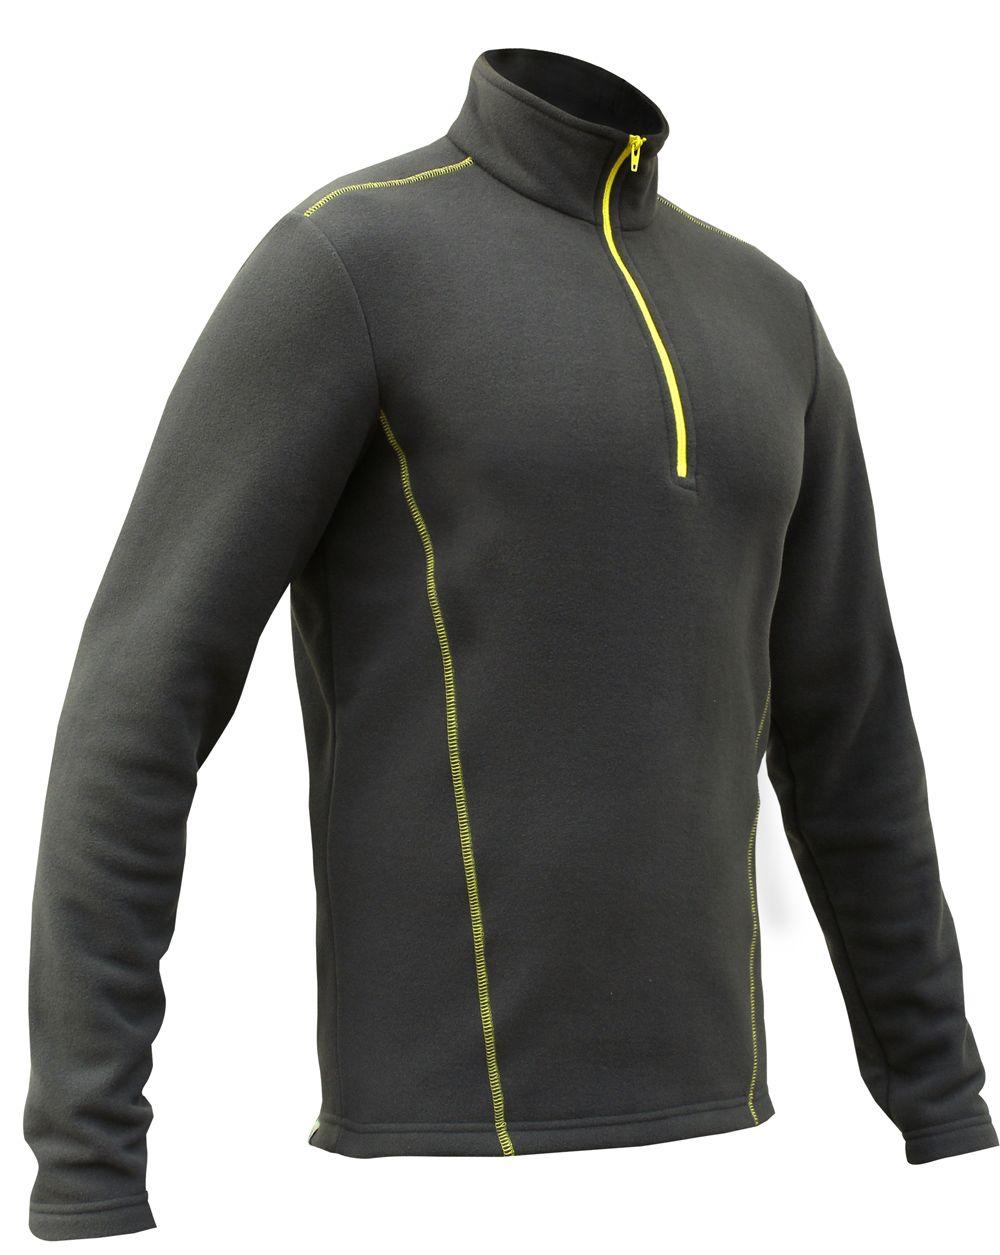 dfe901a53 Sivugin 1/4 Zip Polar Fleece Pullover. Perfect midlayer for outdoor ...